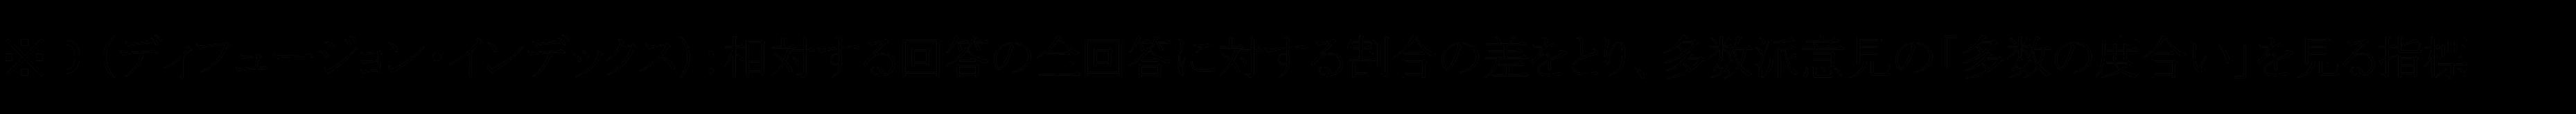 201608087